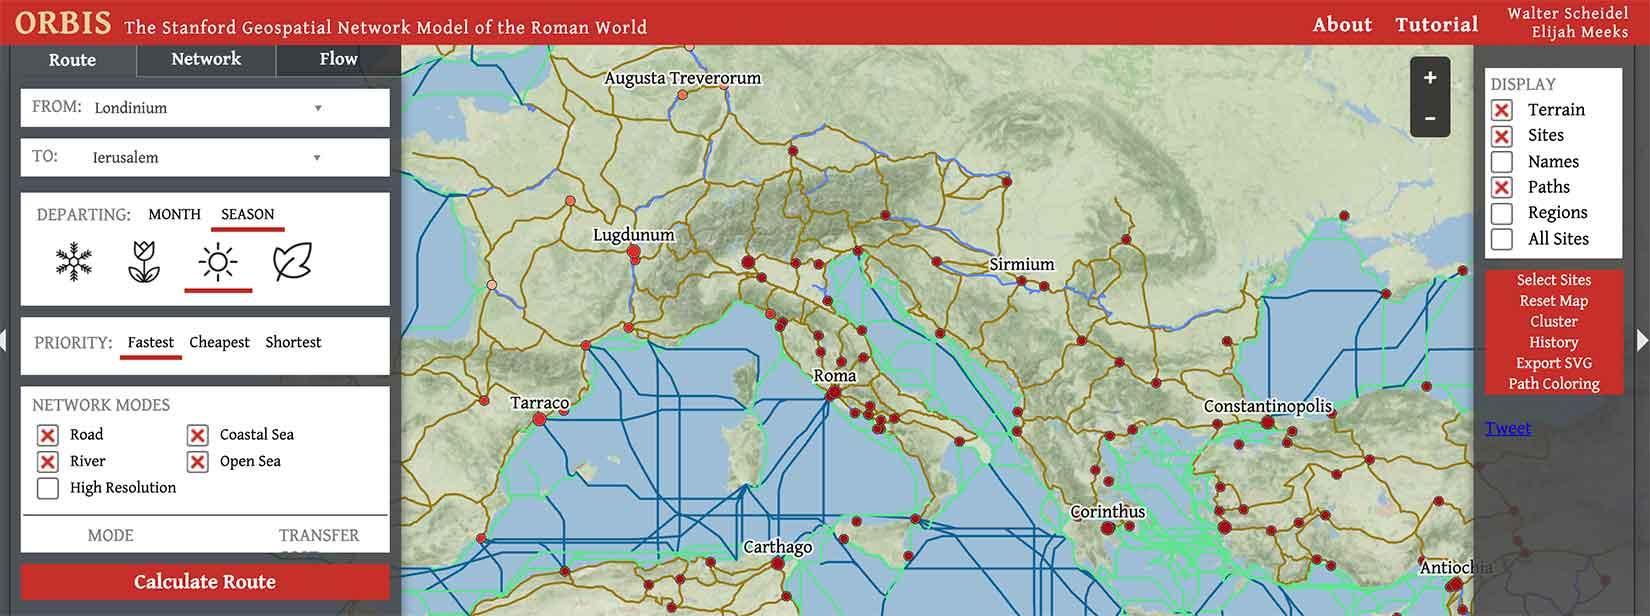 Orbis-Geospatial-Network-Rome-Travel-Distance-Screen